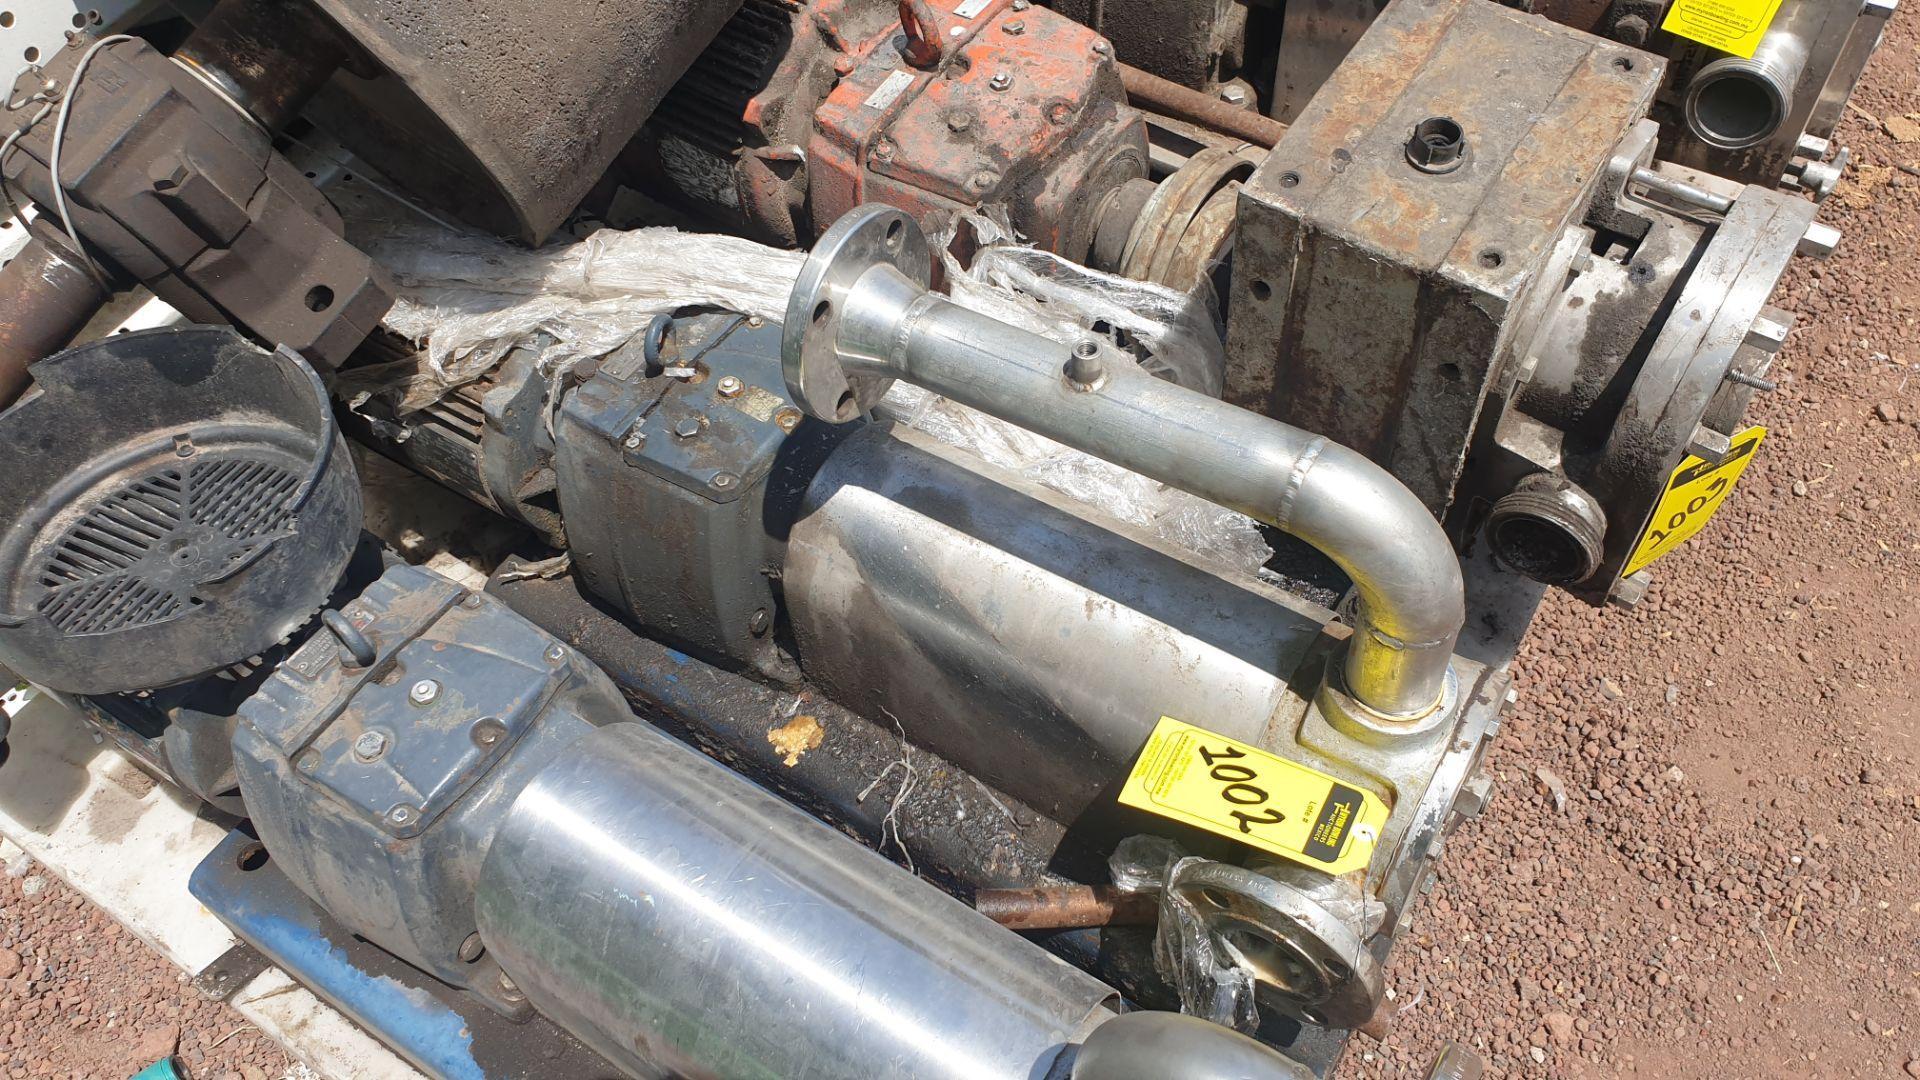 Pneumatic pump, includes emerson motor, model 684982 capacity 10Hp 230v - 460v - Image 8 of 8